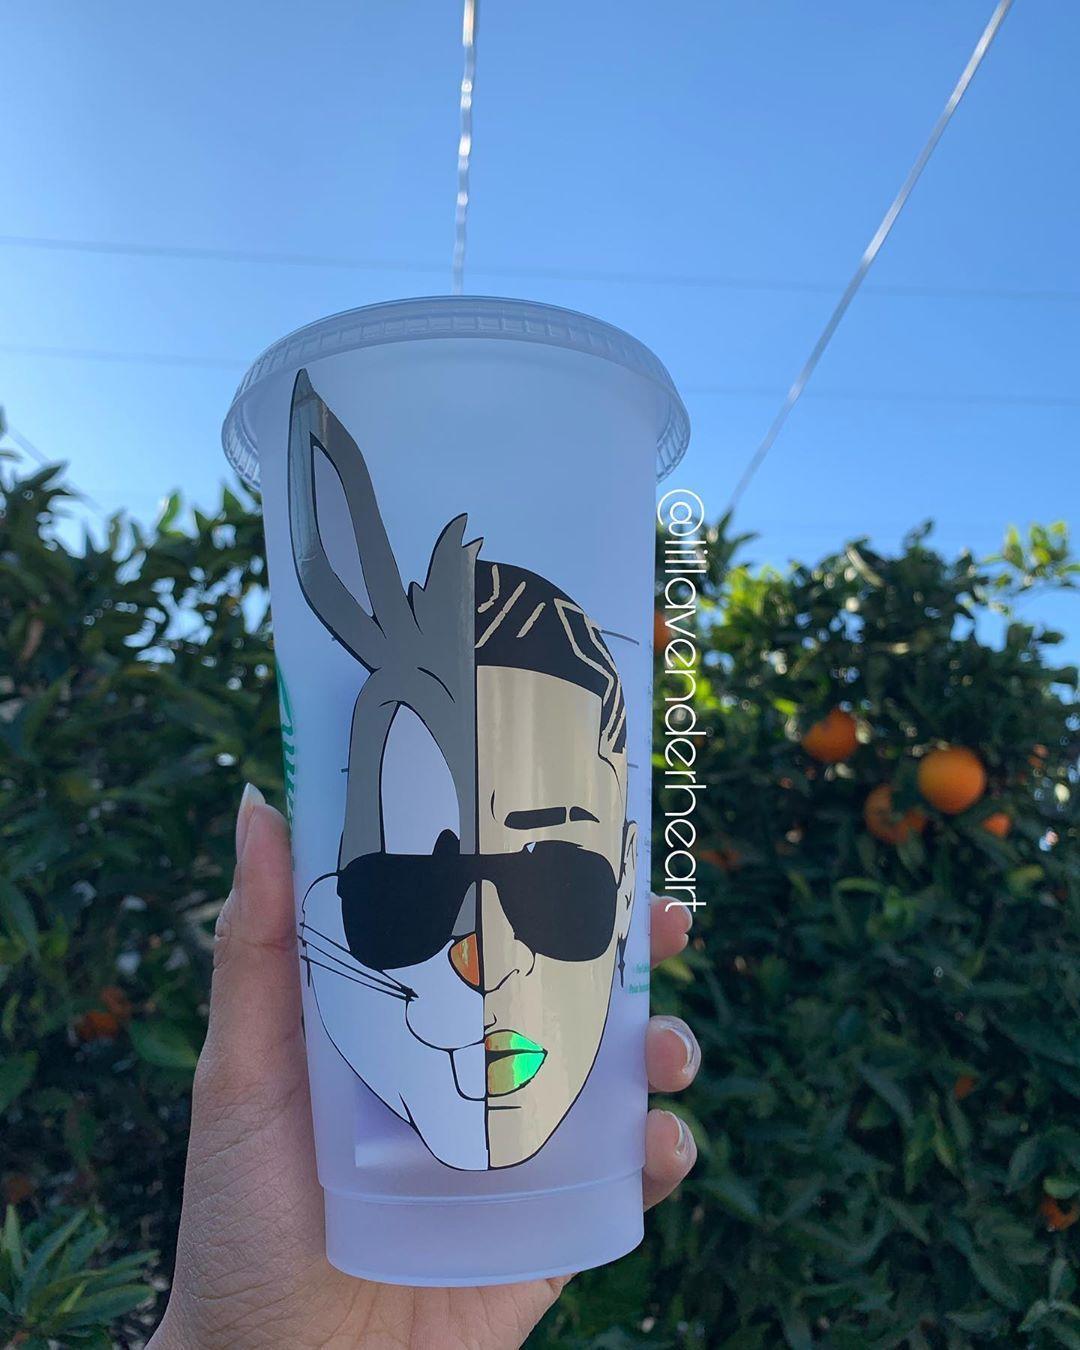 Lillavenderheart On Instagram Bad Bunny Or Bugs Bunny Badbunny Starbucks Badbunny Lillavenderheart On Instagram Bad Bunny Or Bugs Bunny Ba 2020 Bahar